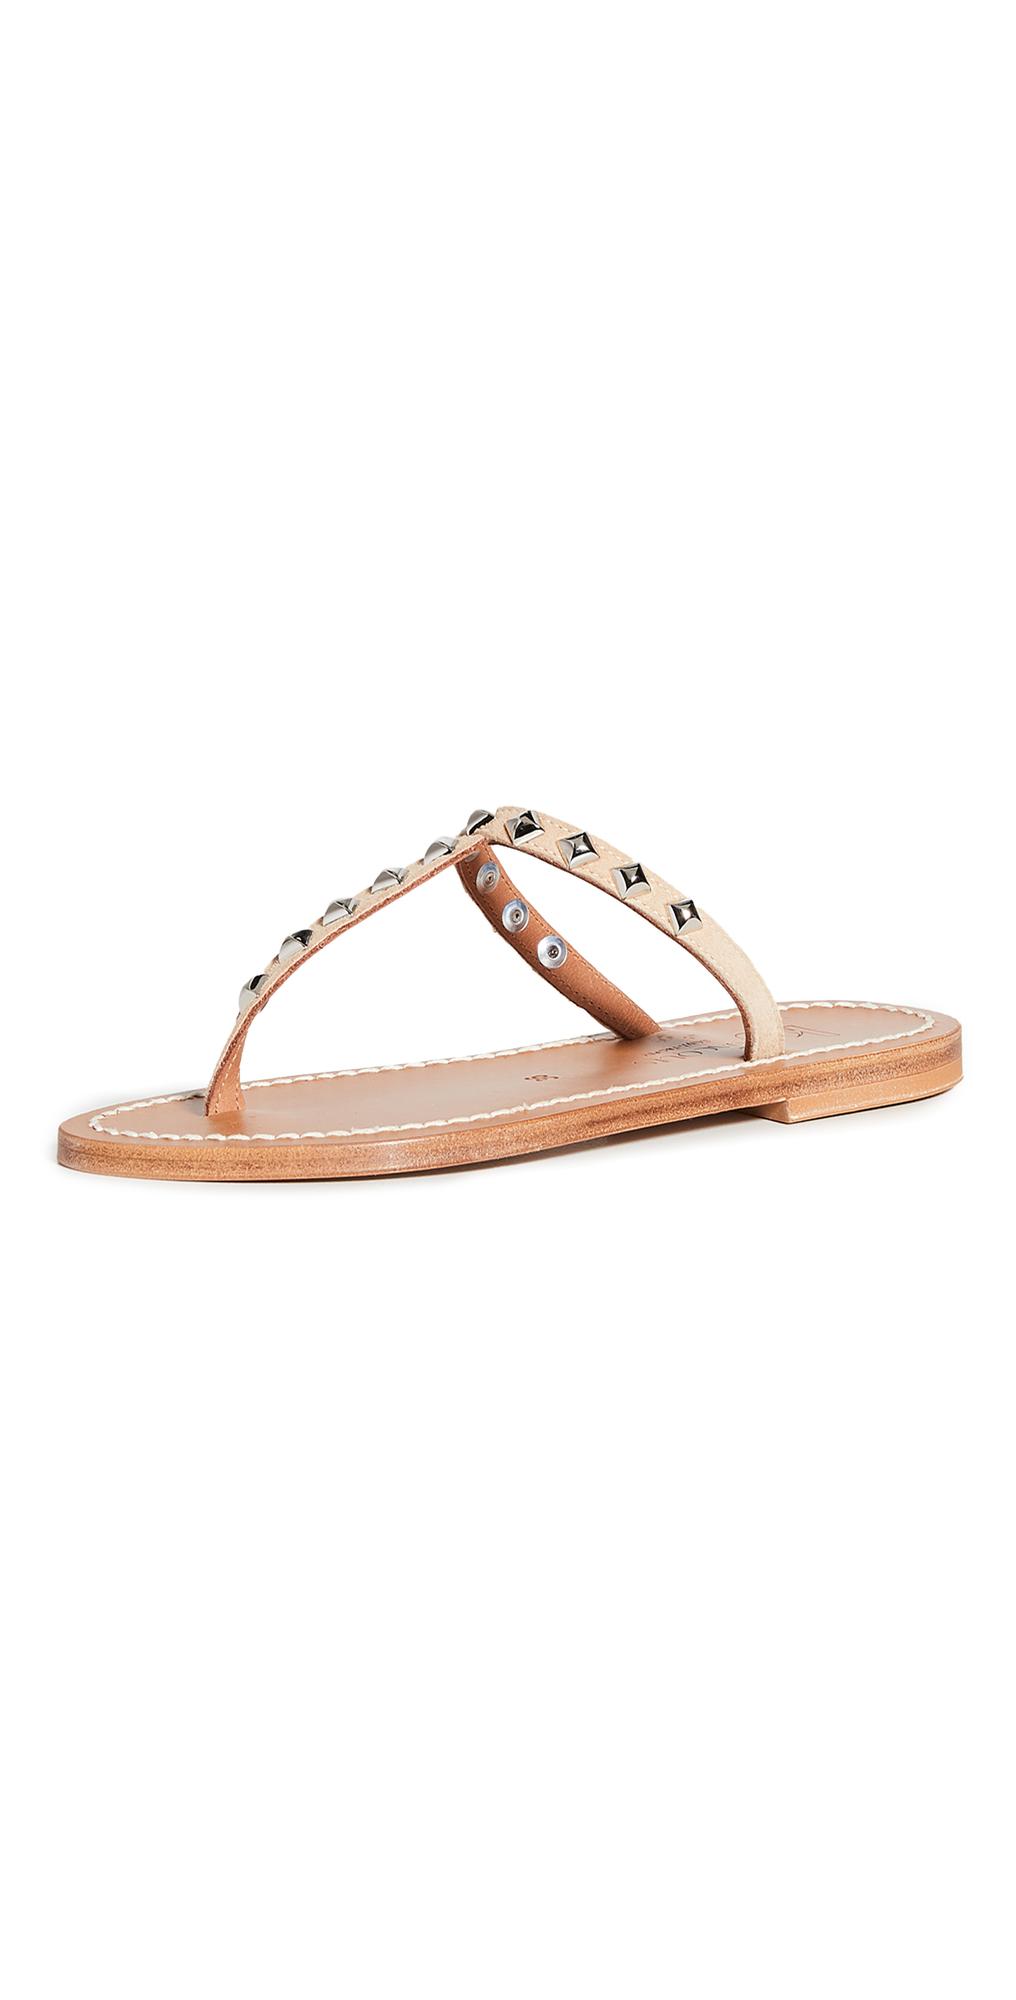 GizehPyr Sandals